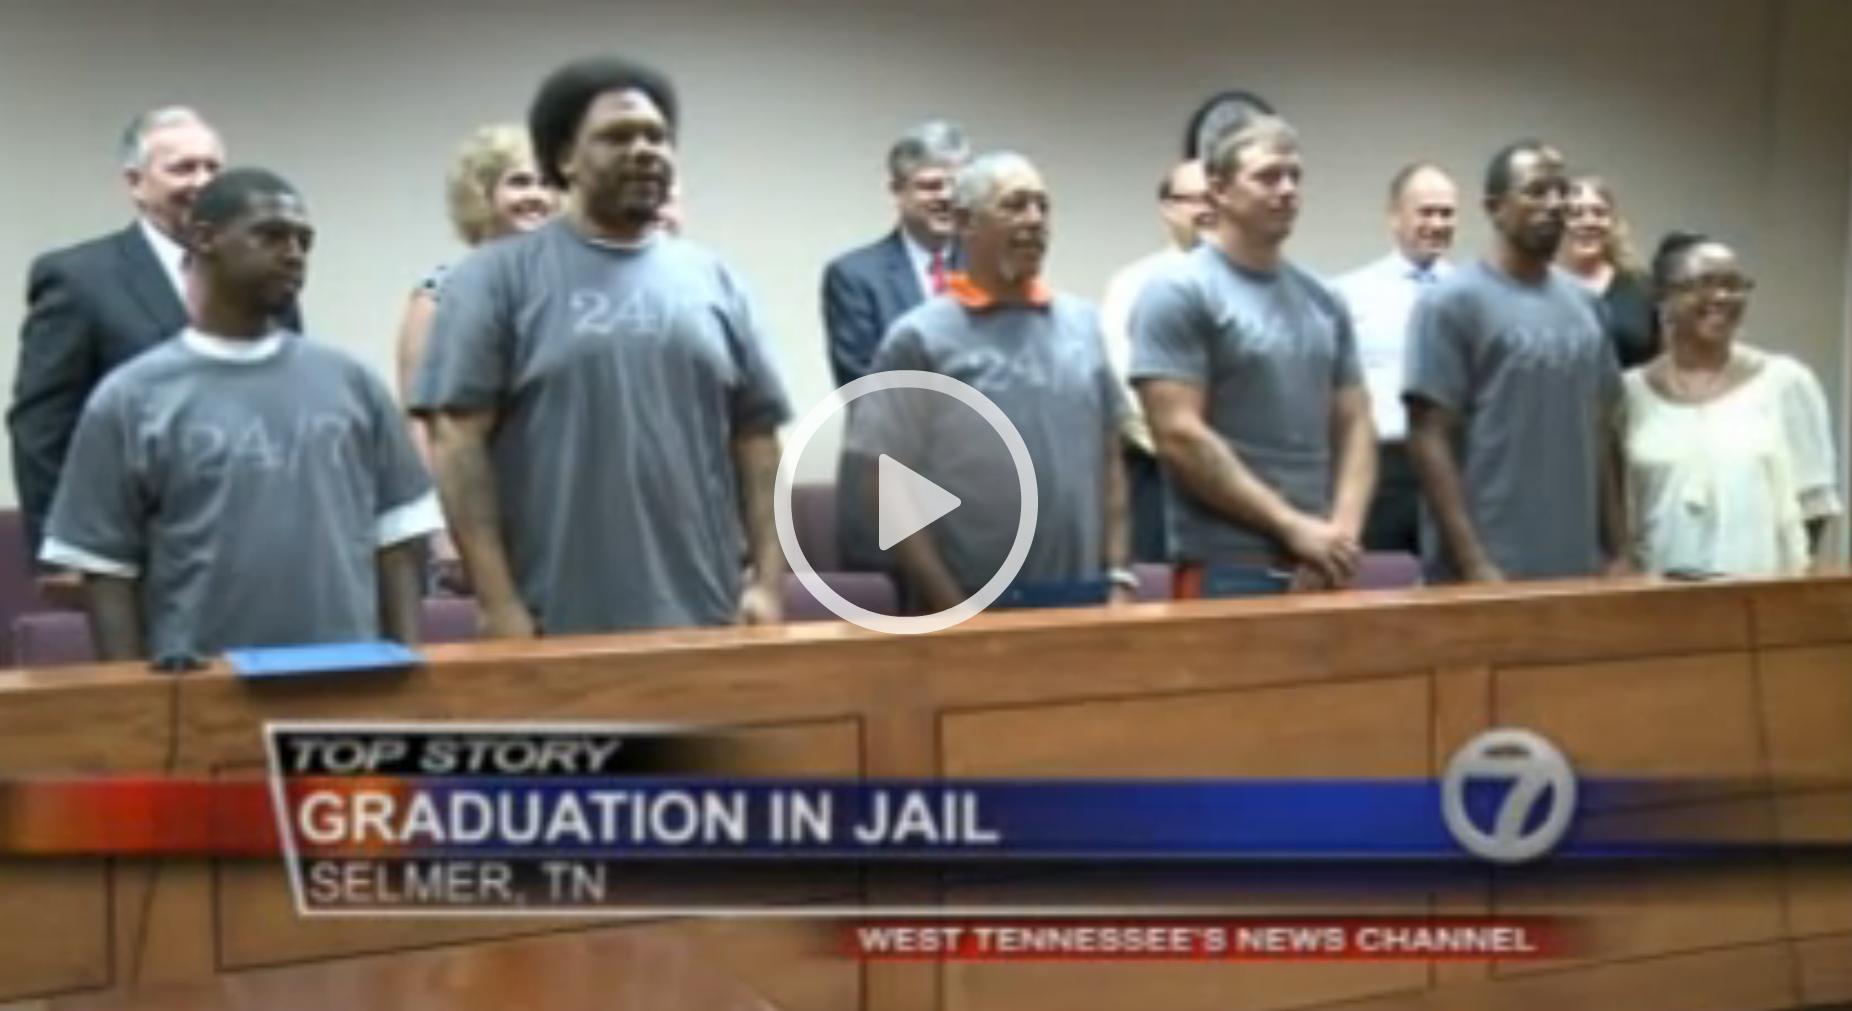 tenn_dads_graduate_in_jail